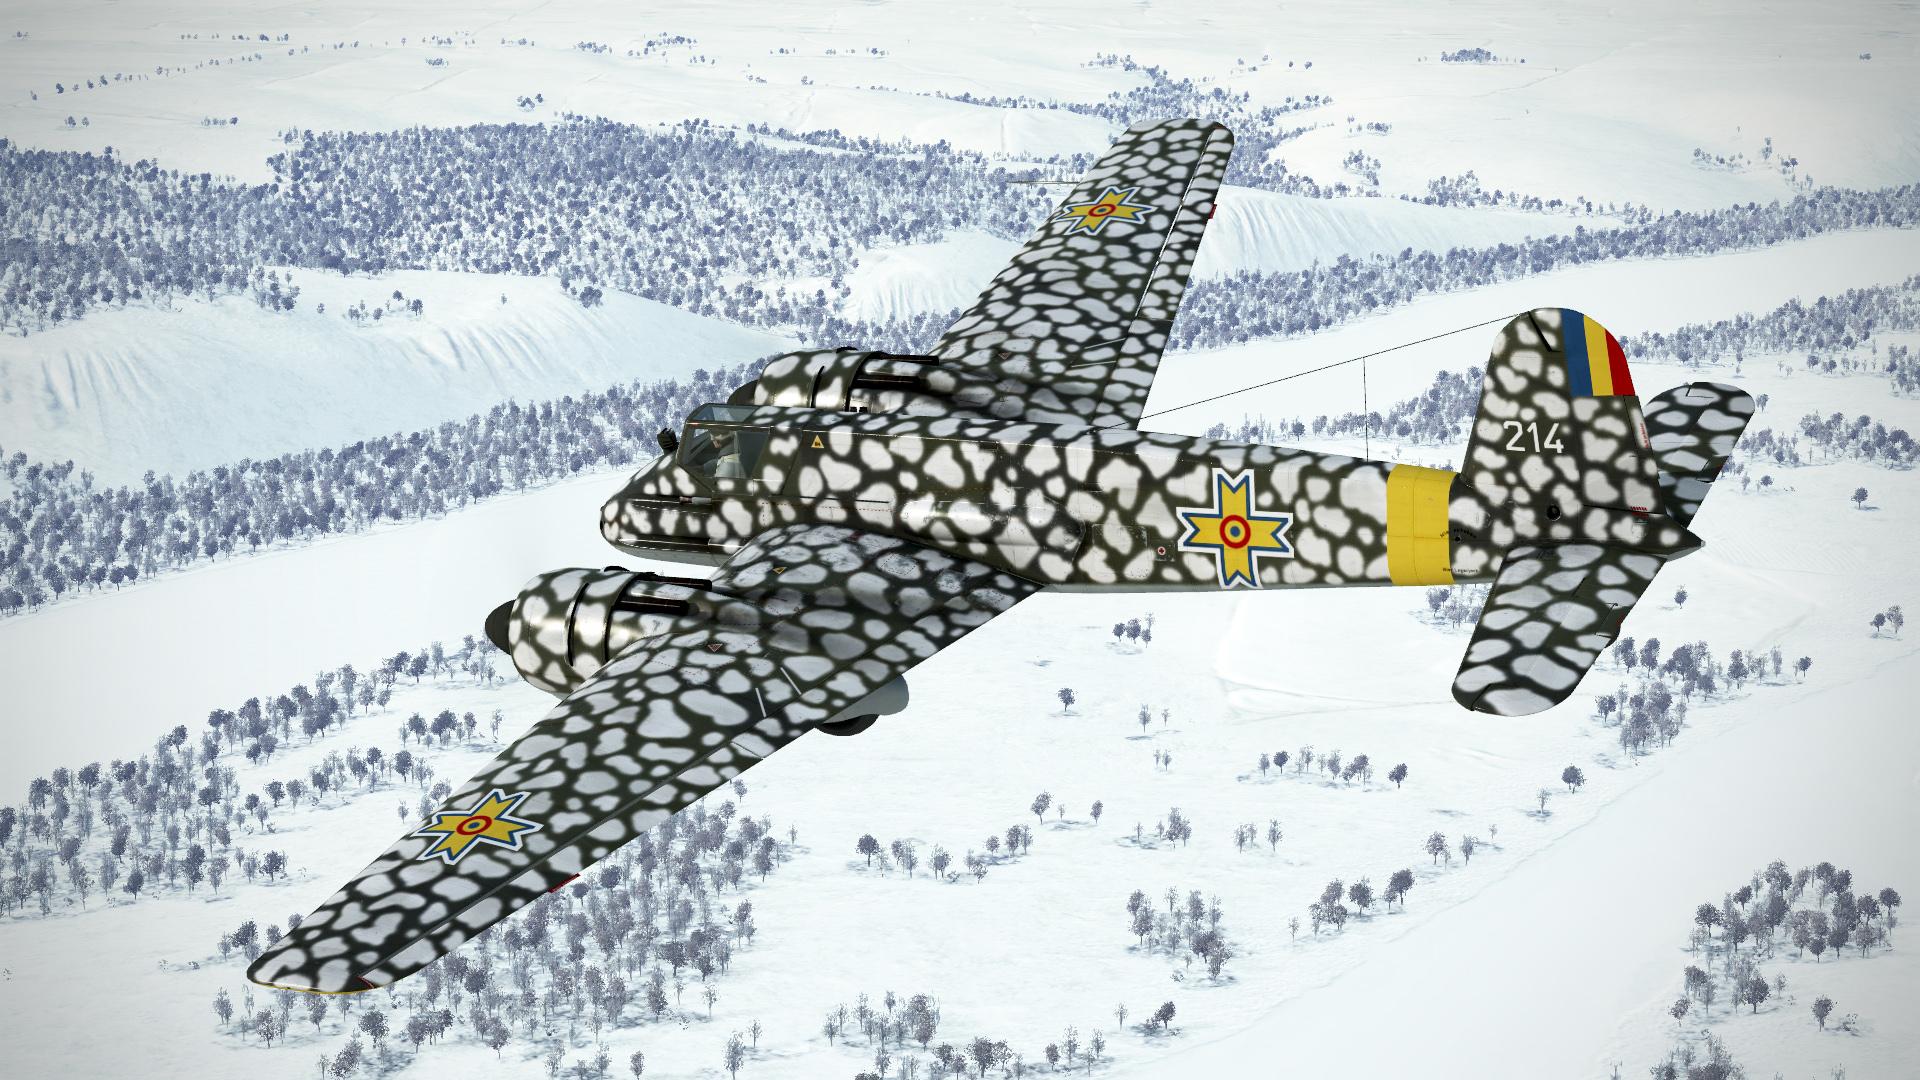 IL-2 Sturmovik: Hs 129 B-2 Collector Plane